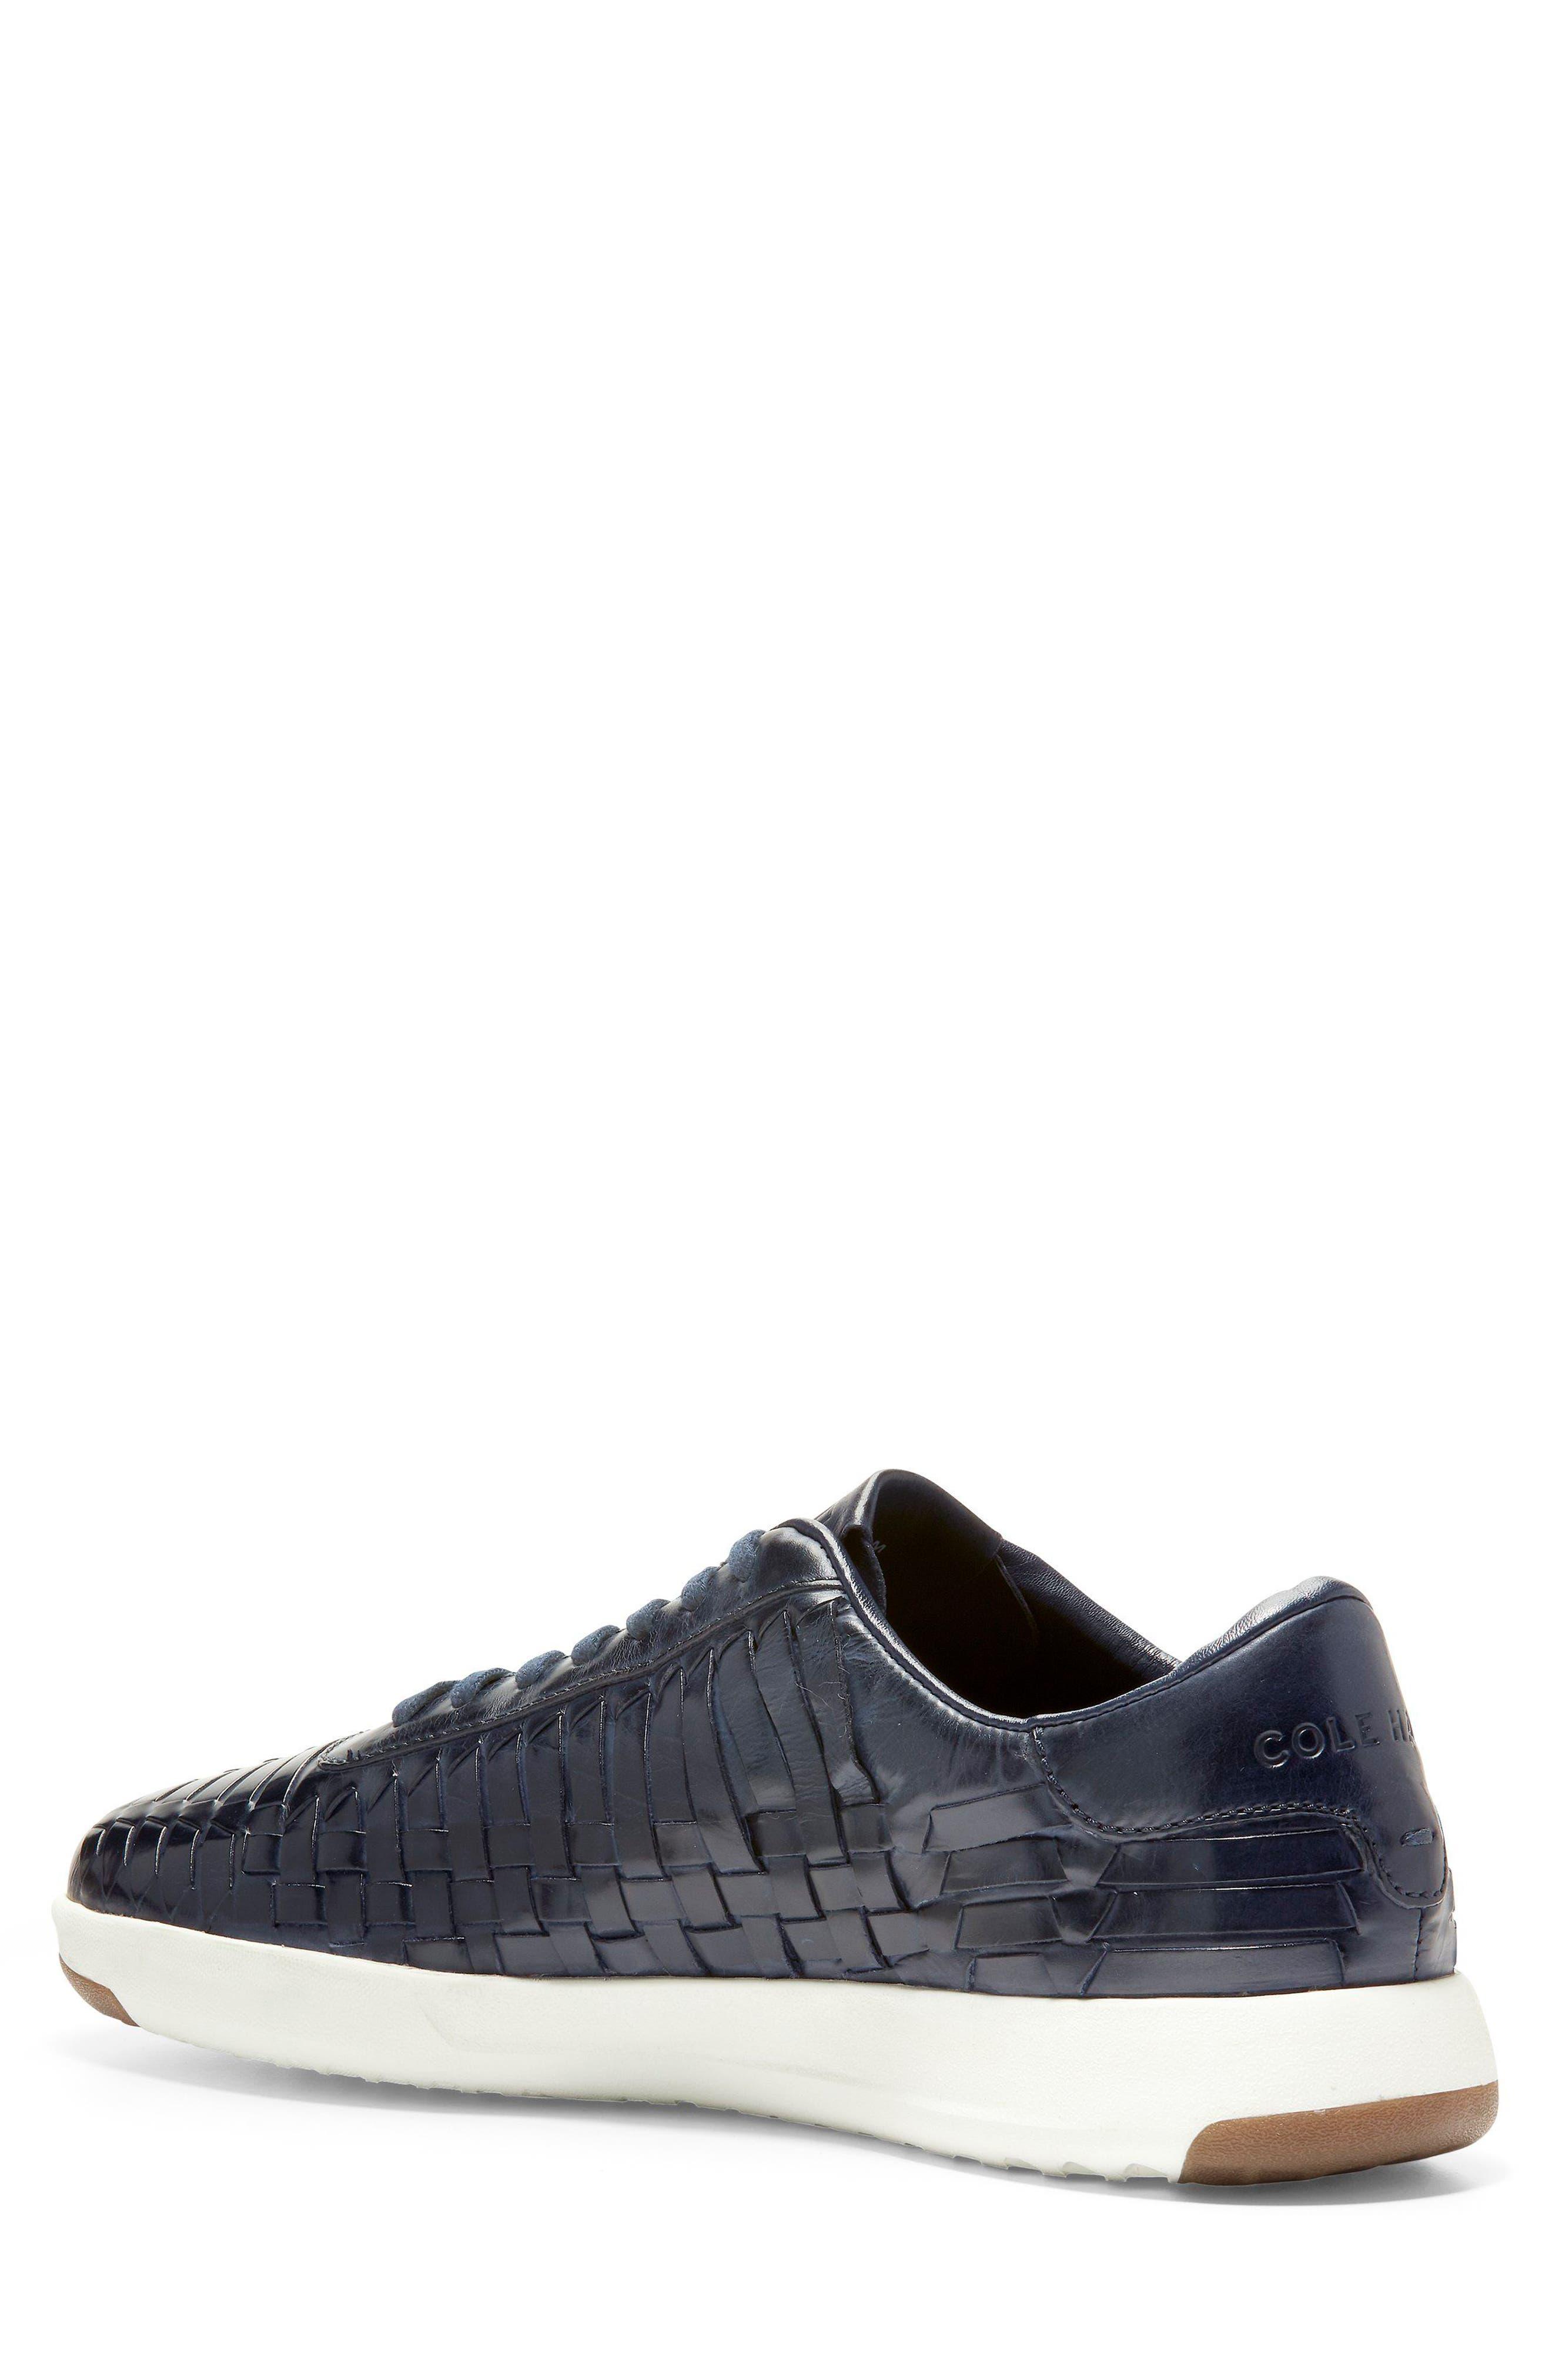 GrandPro Tennis Huarache Sneaker,                             Alternate thumbnail 2, color,                             Navy Woven Burnish